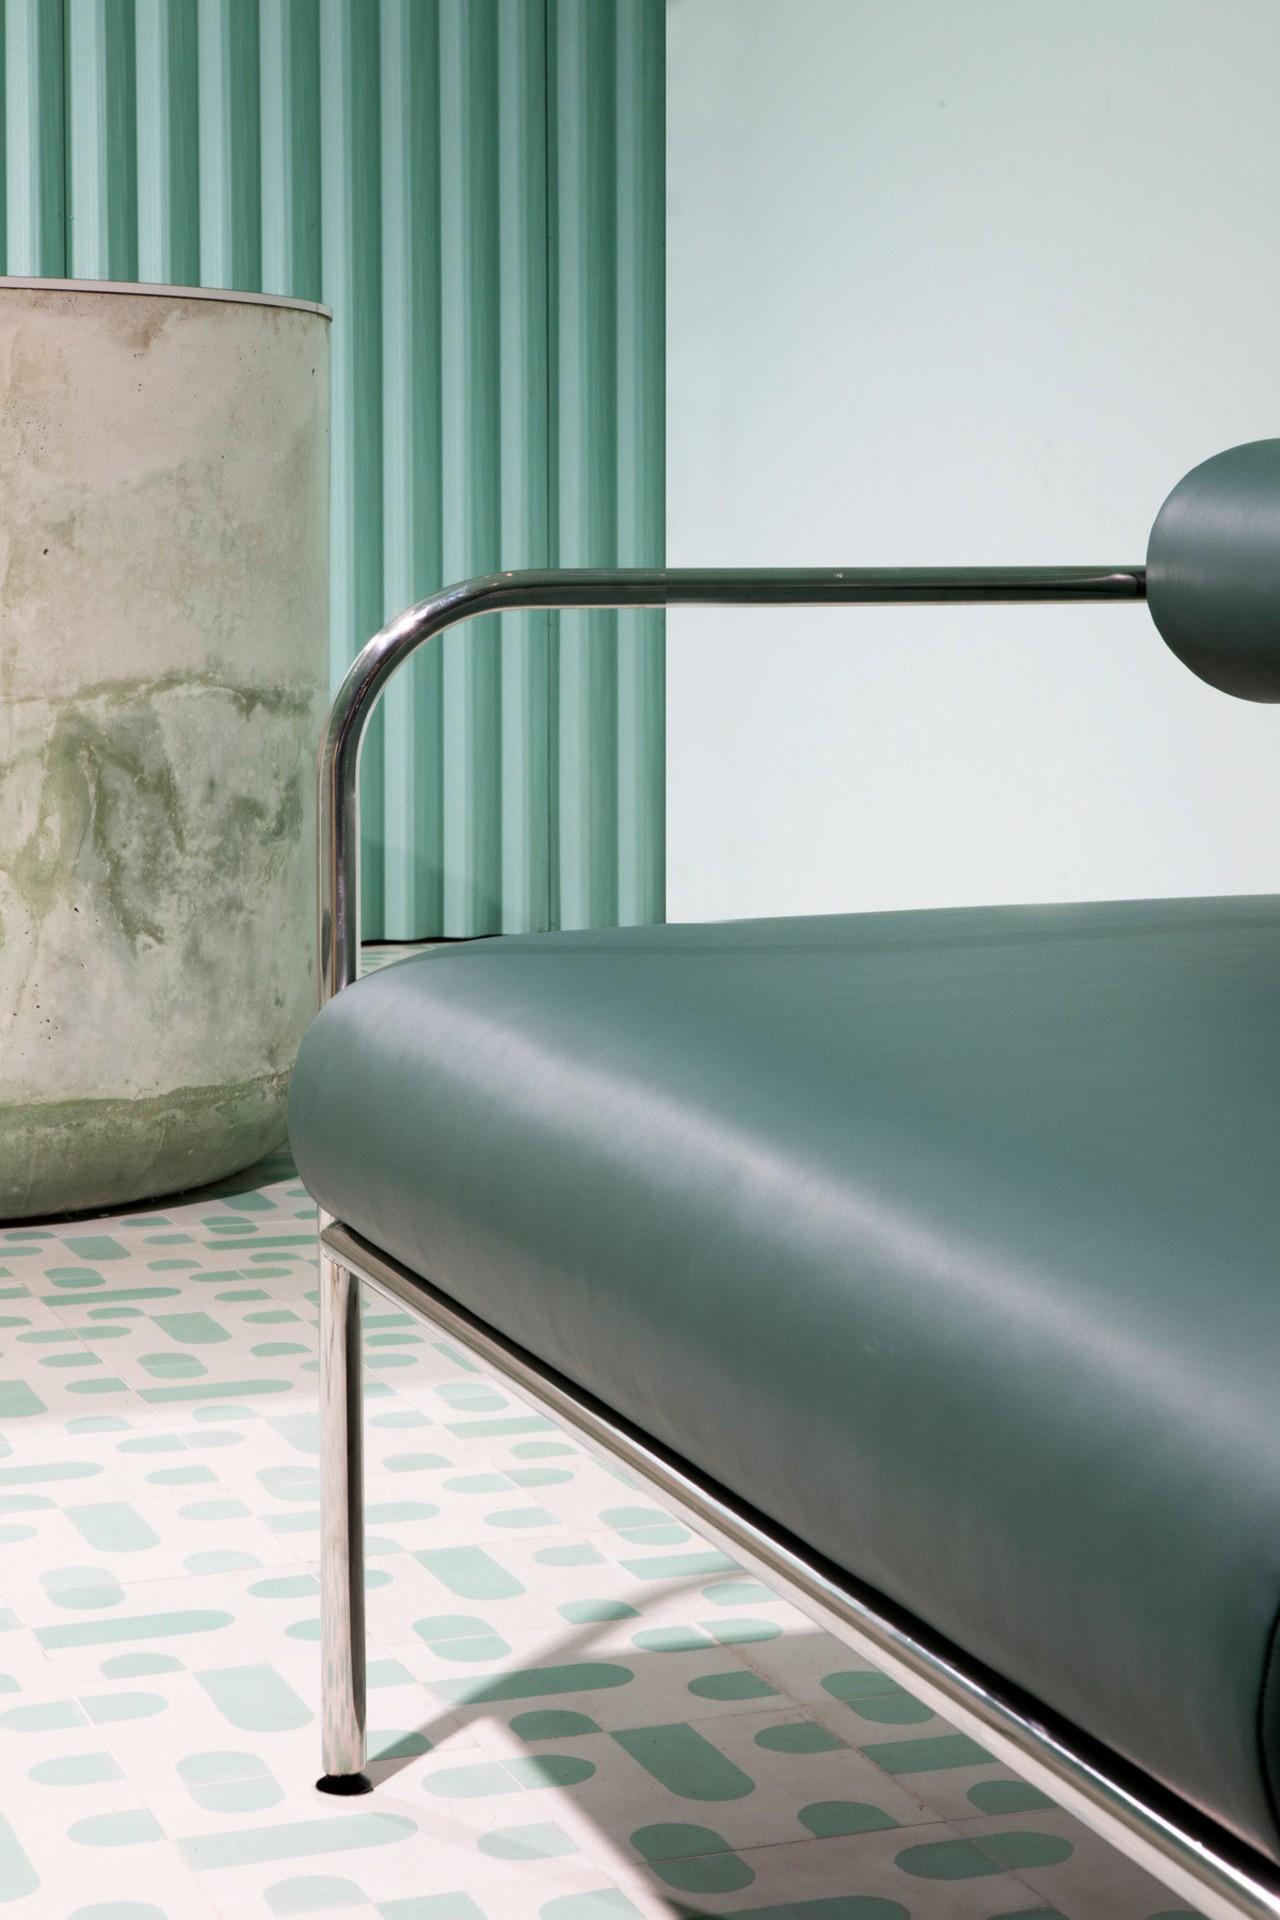 Sergio Mannino Studio designed this pharmacy to be chair, furniture, interior design, lighting, product design, table, white, gray